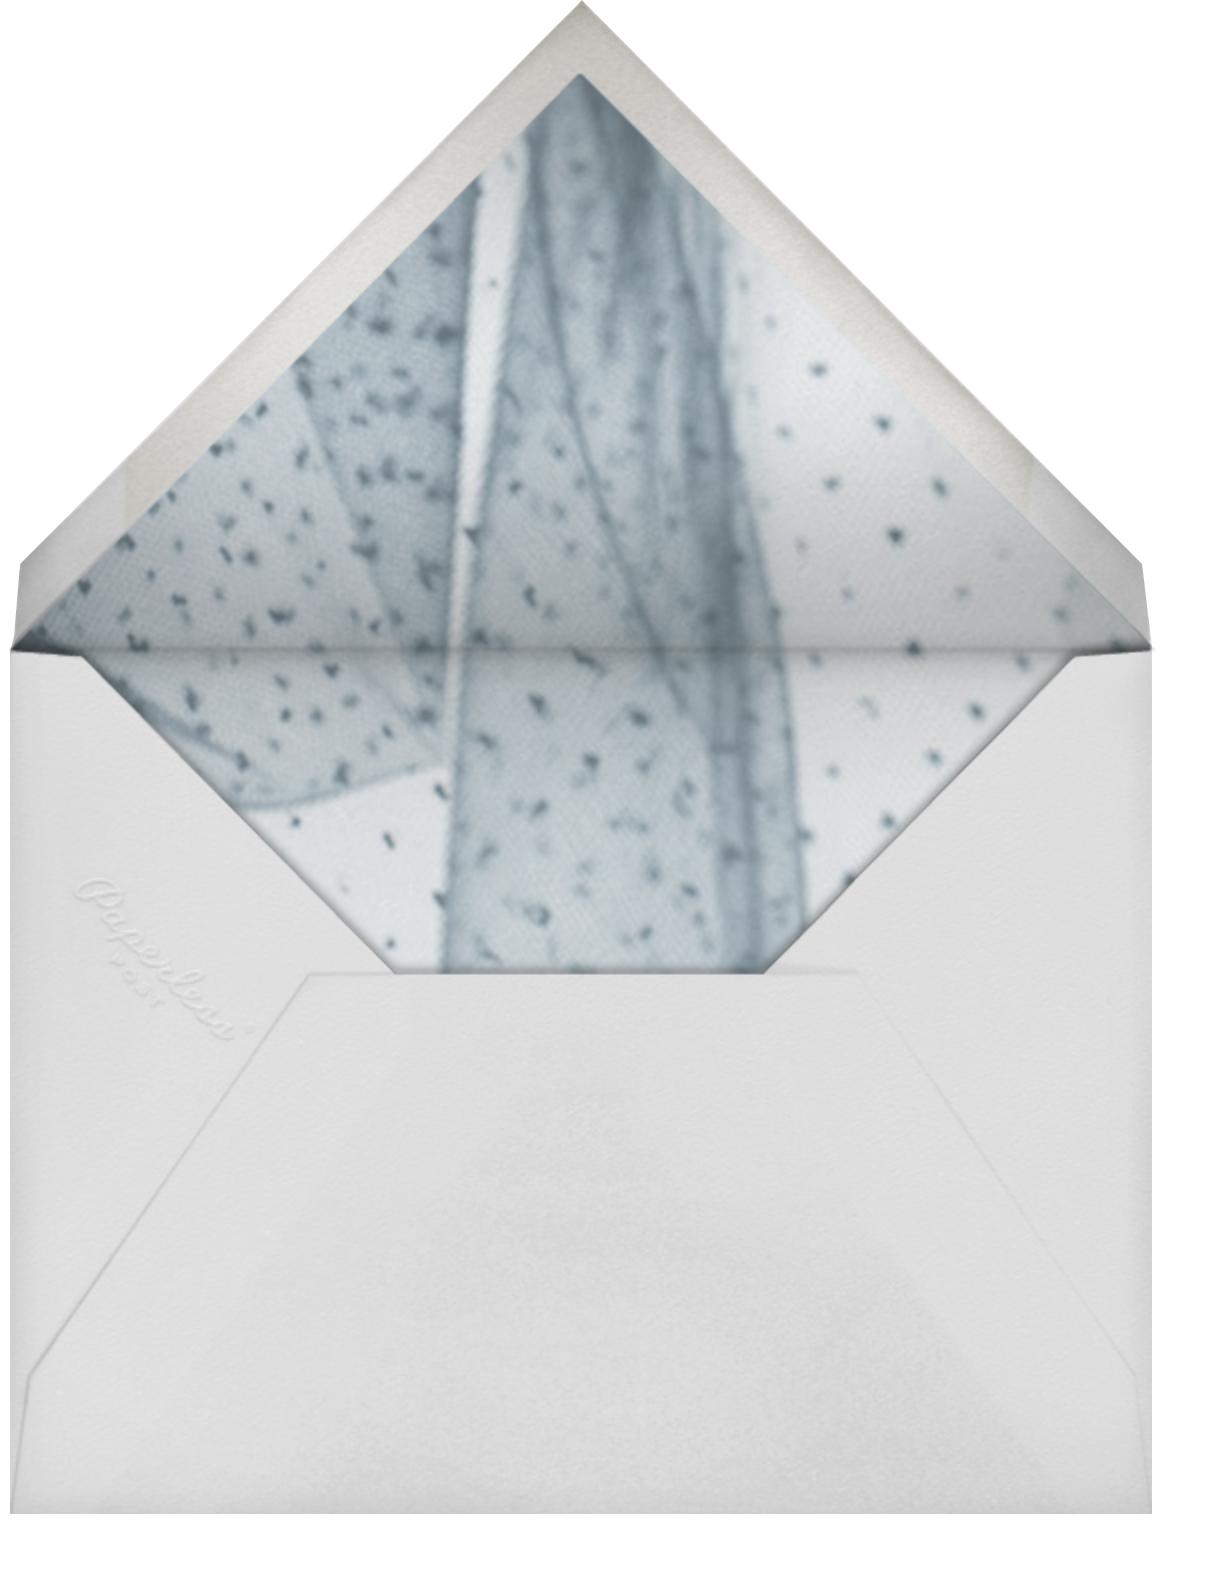 Navy (Tall) - Paperless Post - Envelope